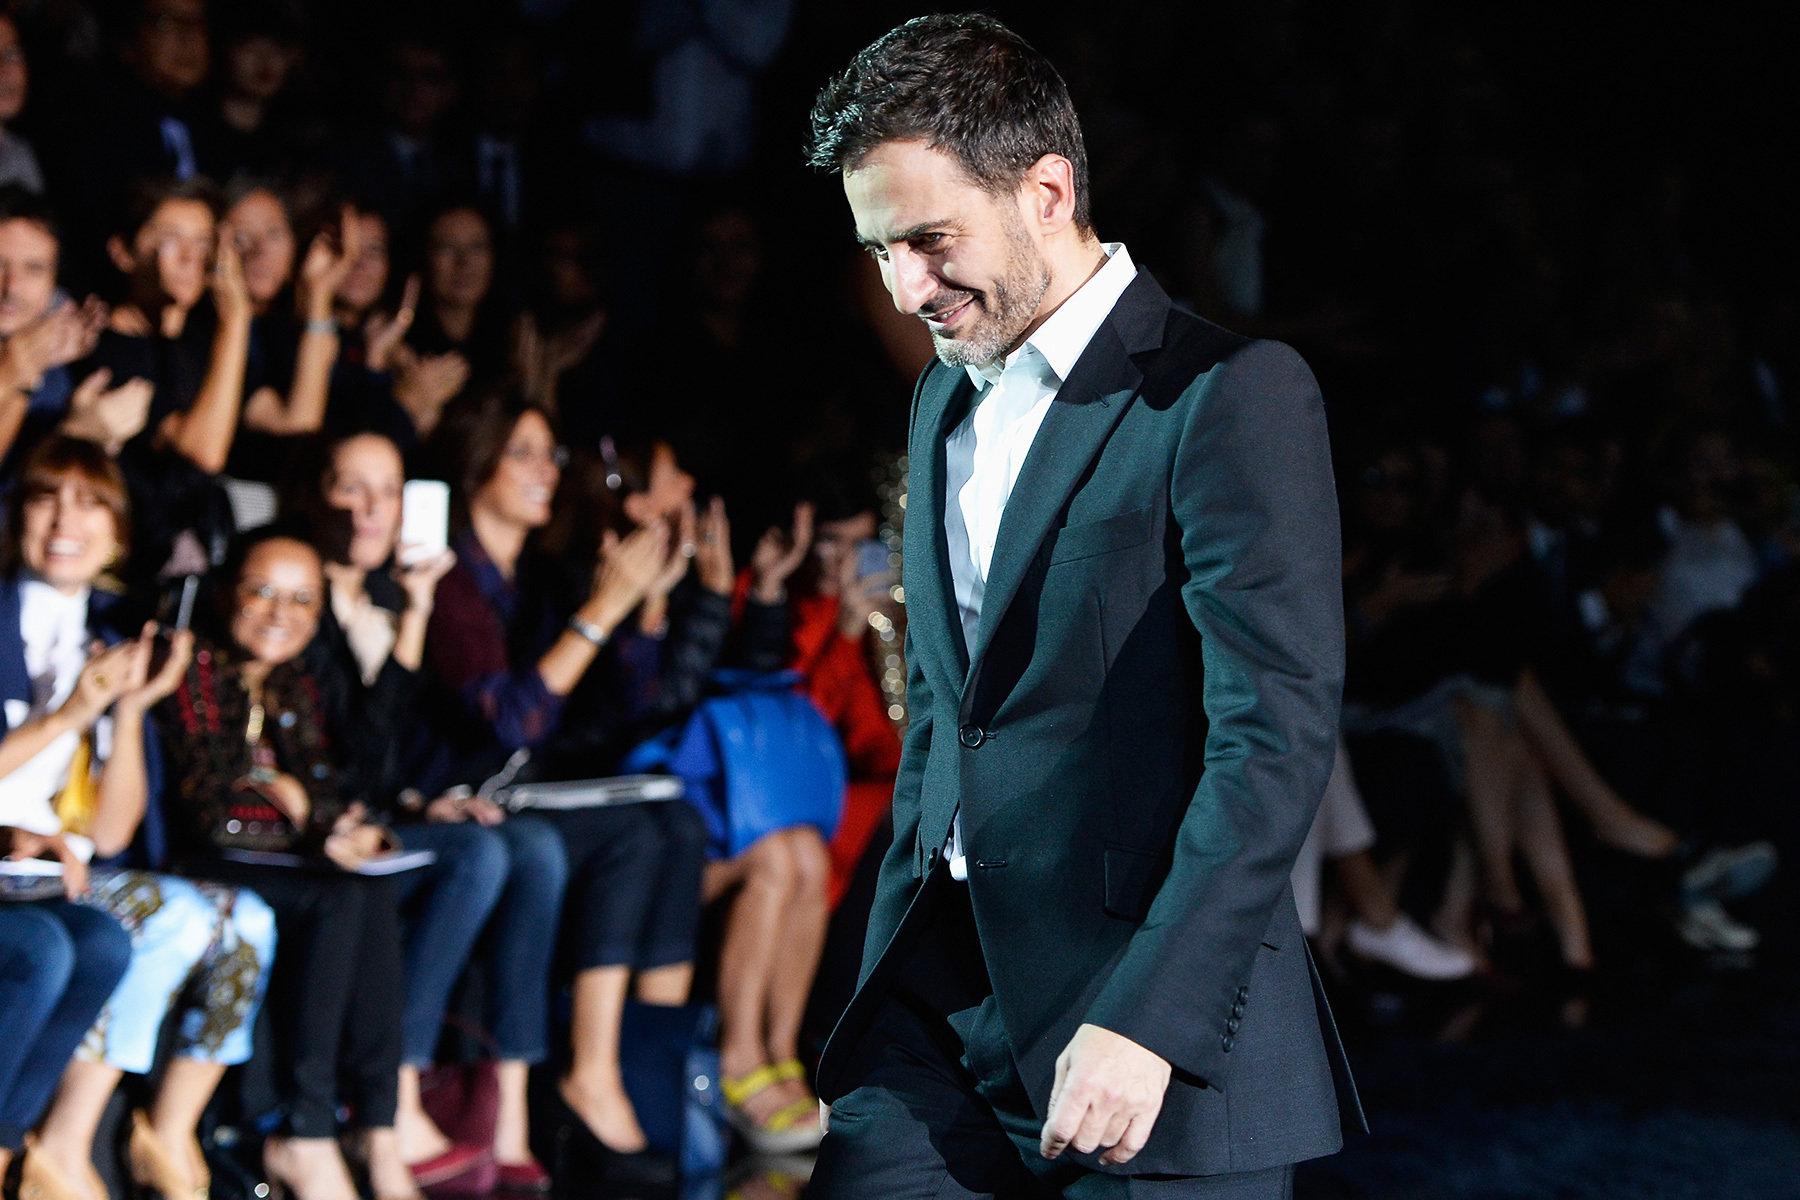 Marc Jacobs Leaves Louis Vuitton, Has Crazy Final Runway show